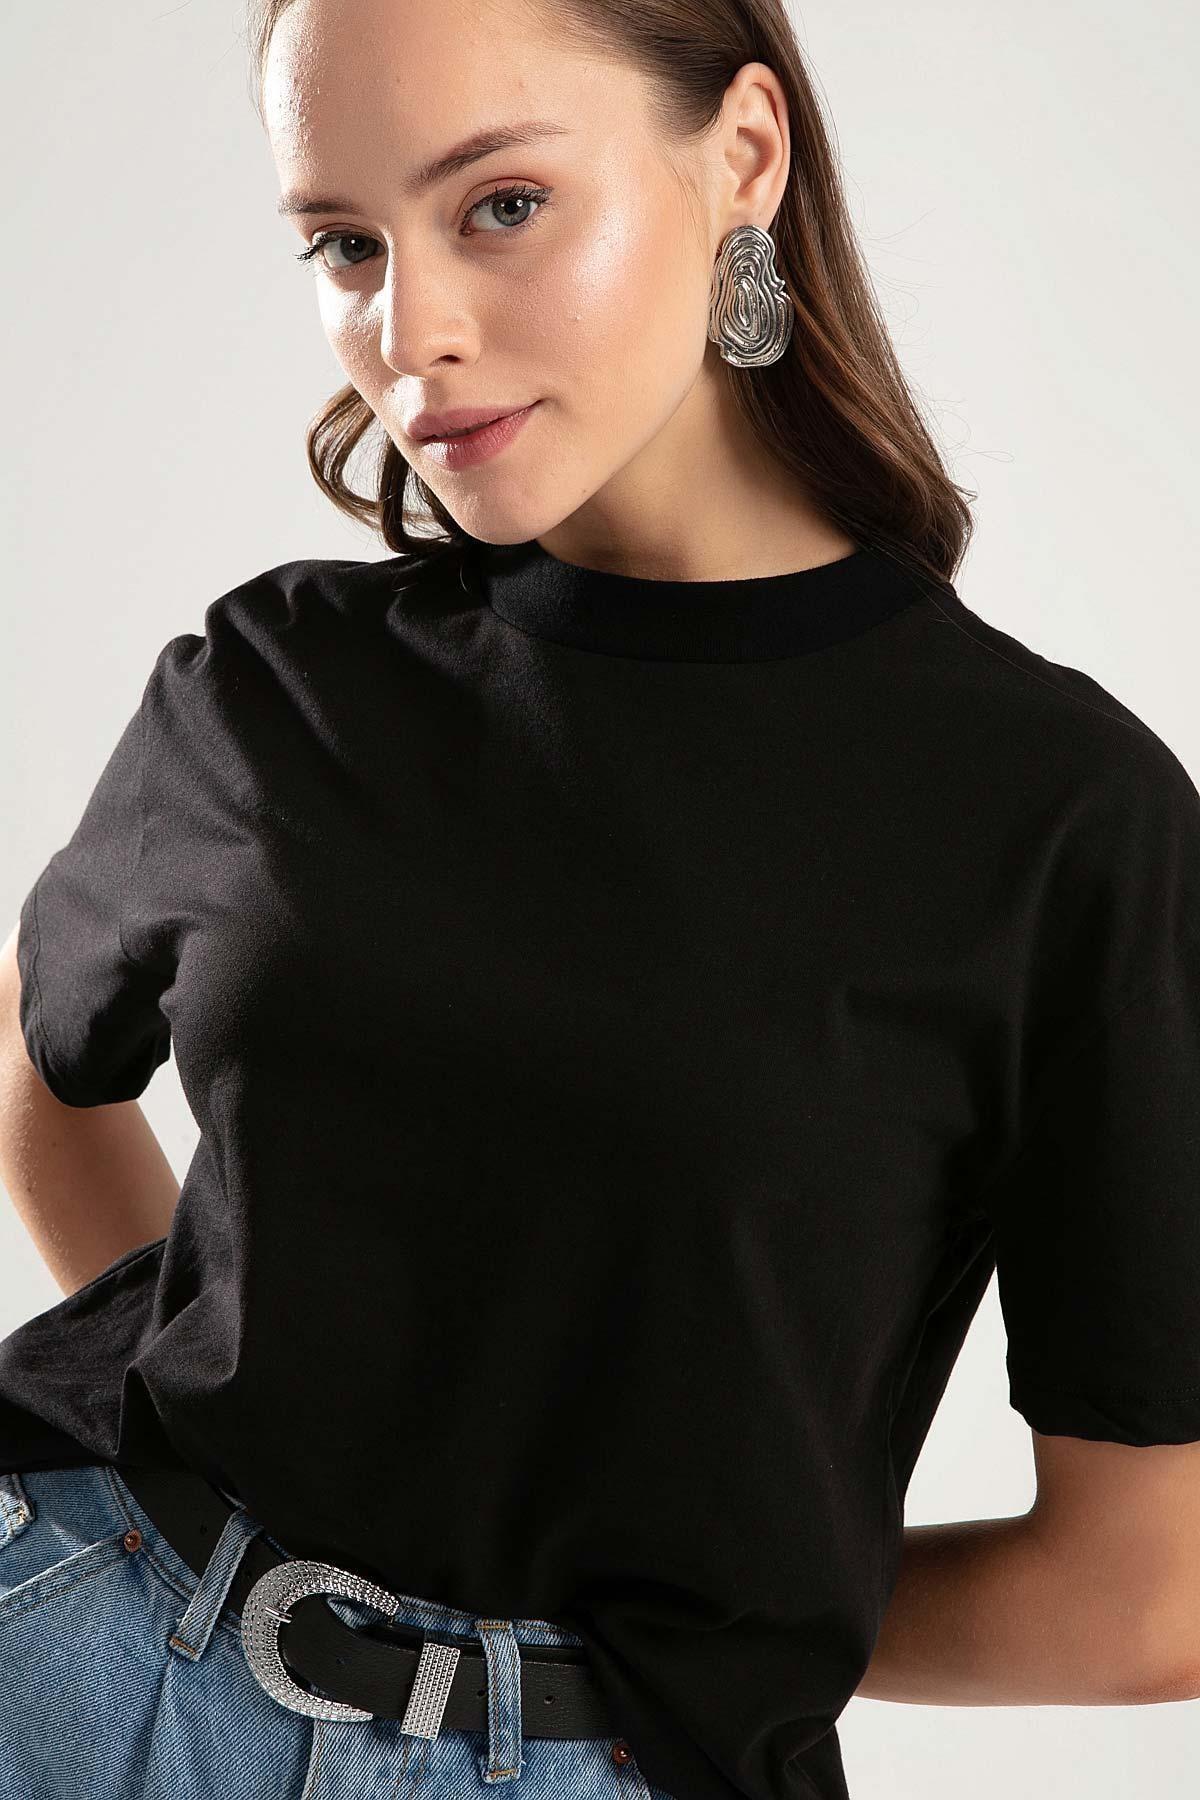 Pattaya Kadın Siyah Dik Yaka Basic Tişört PTTY20S-701 1